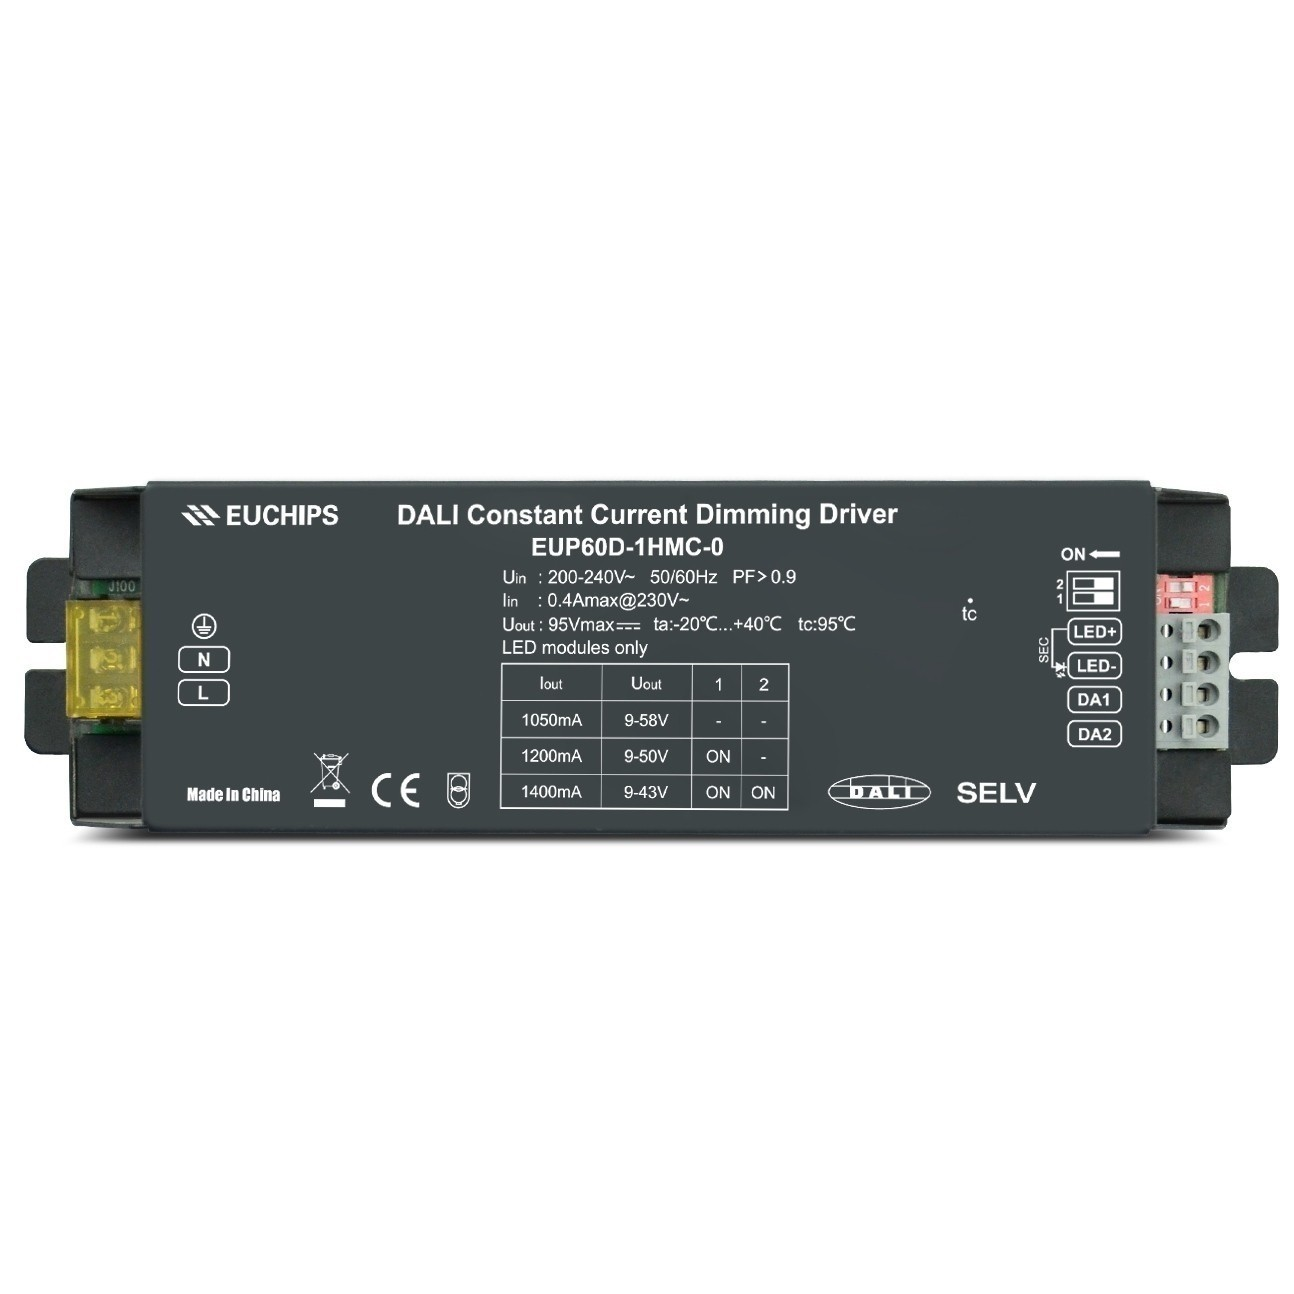 EUP60D-1HMC-0 DALI Constant Current Euchips LED Dimming Driver